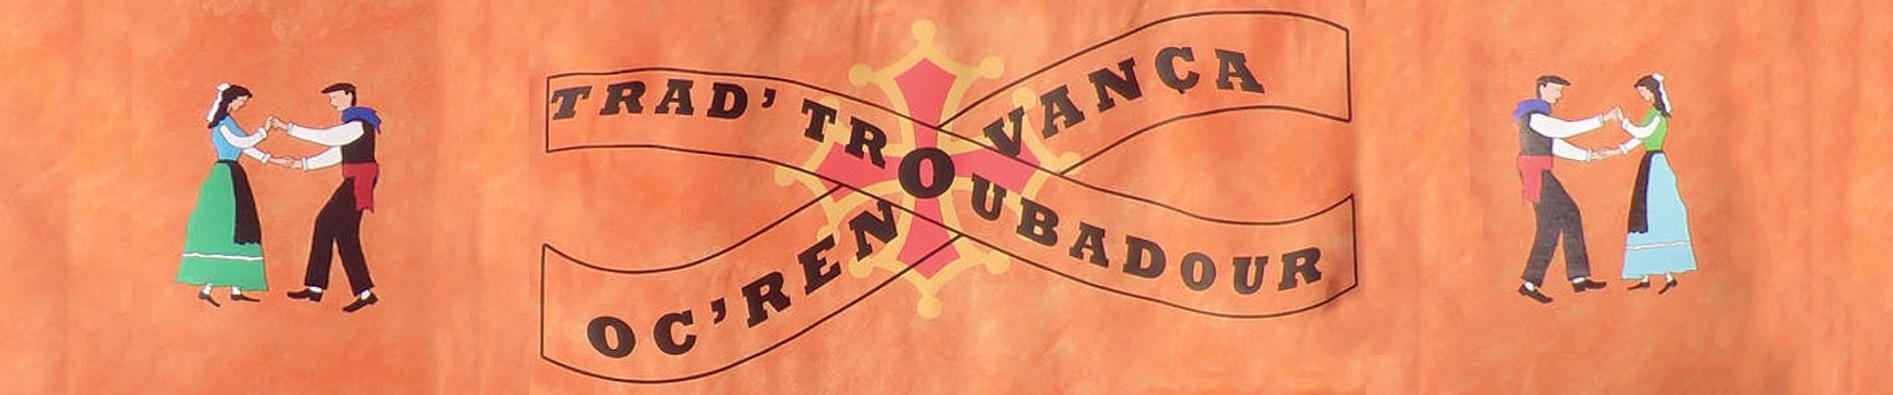 Groupe folklorique Oc'renovença & Tradtroubadours